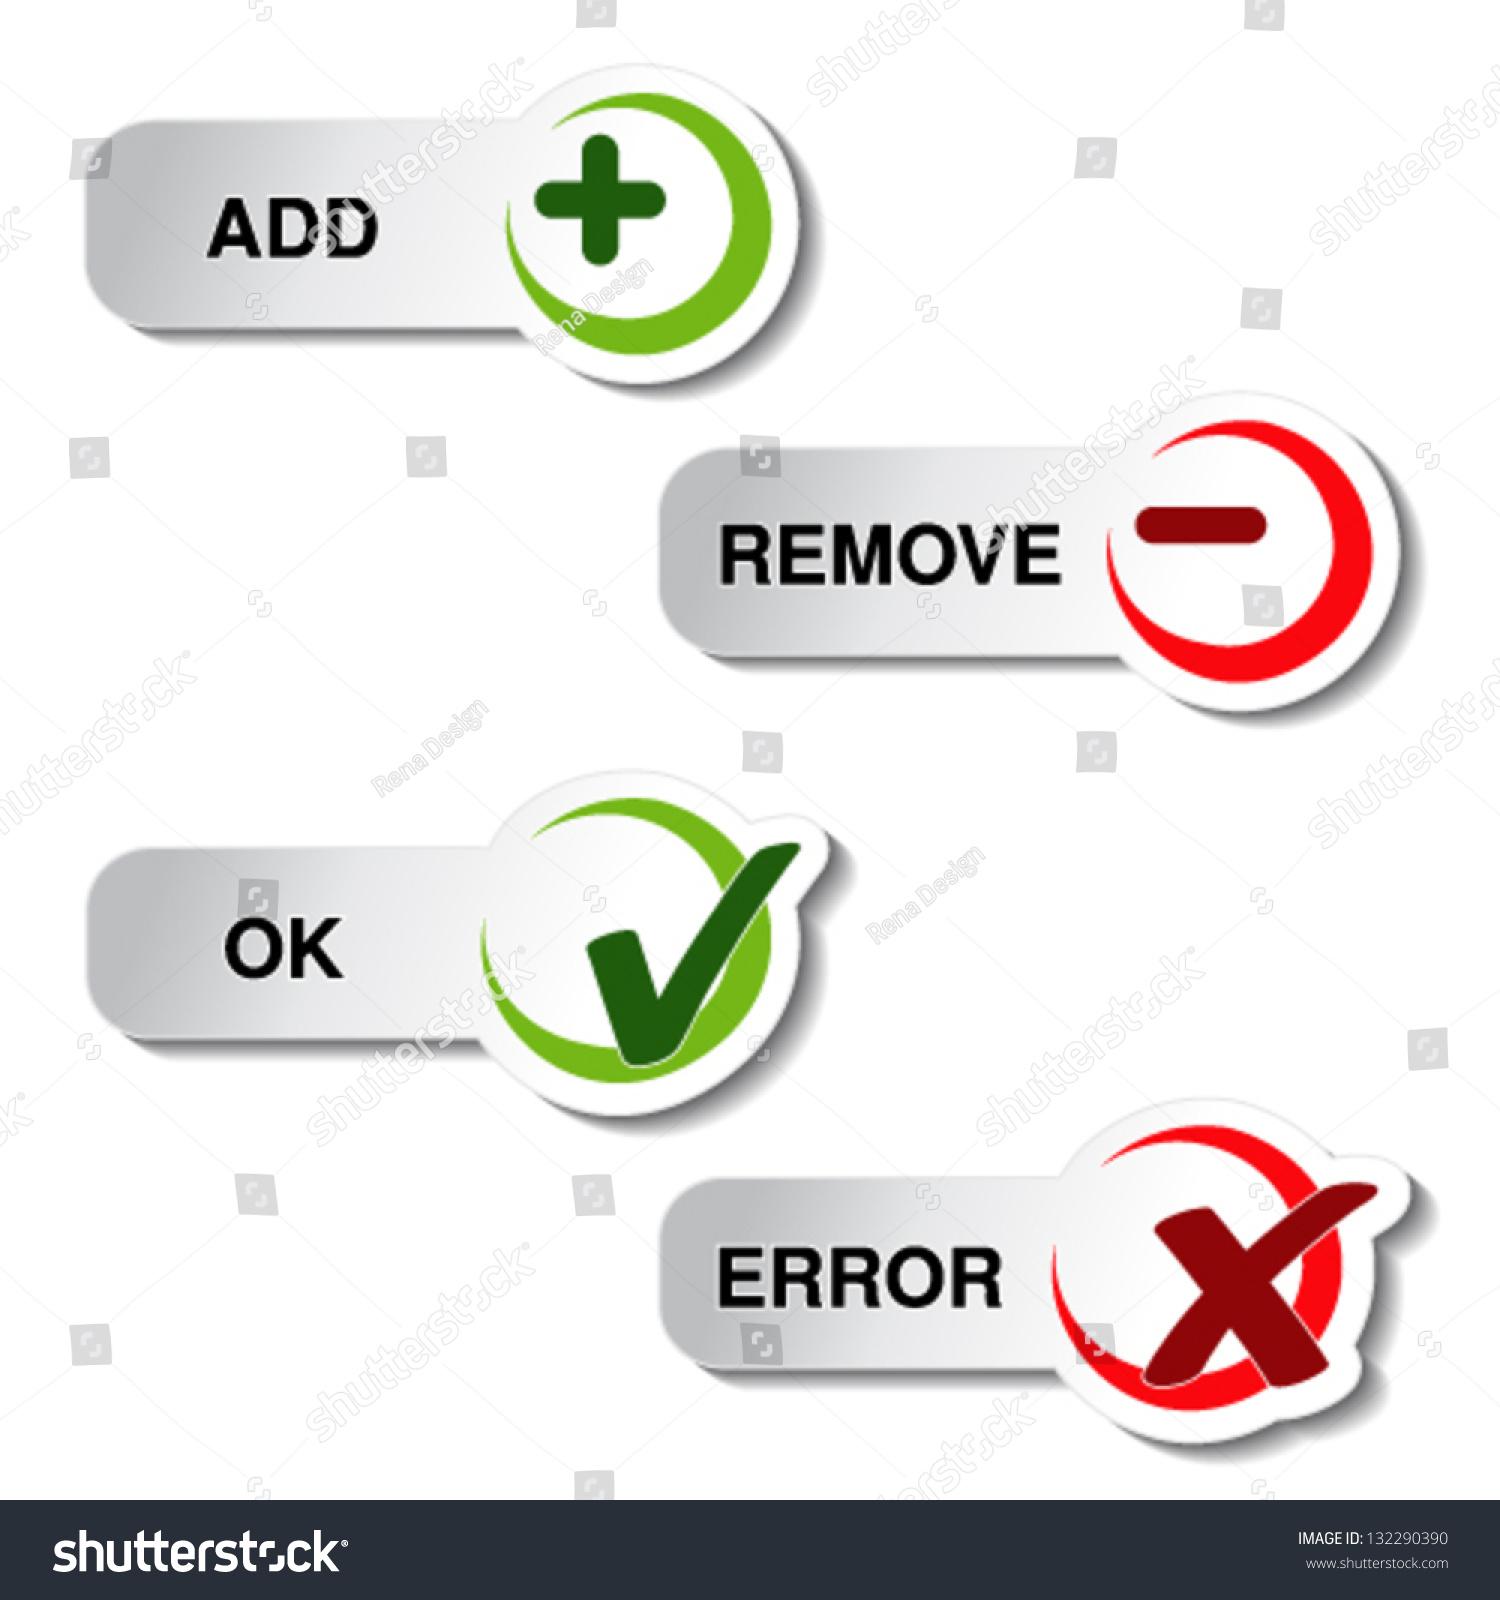 Vector Add Remove Ok Error Item Stock Vector 132290390 - Shutterstock